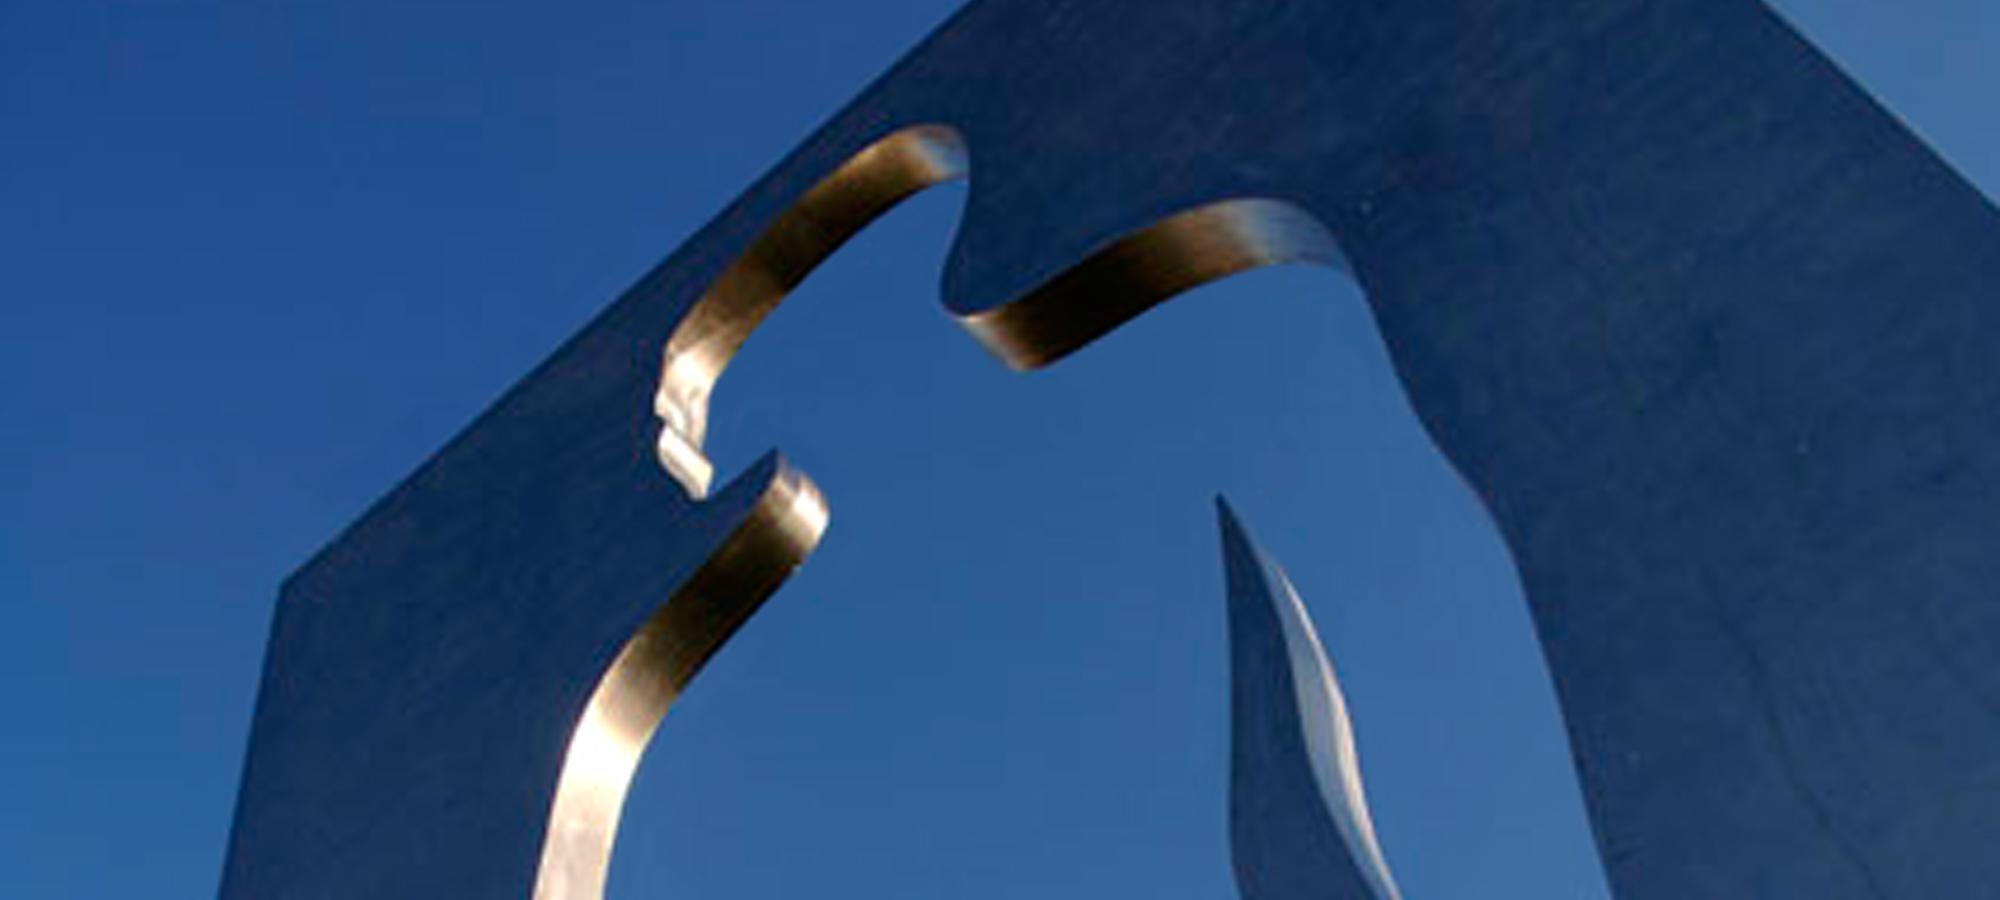 Kunst openbare ruimte-Zwolle-BlokLugthart